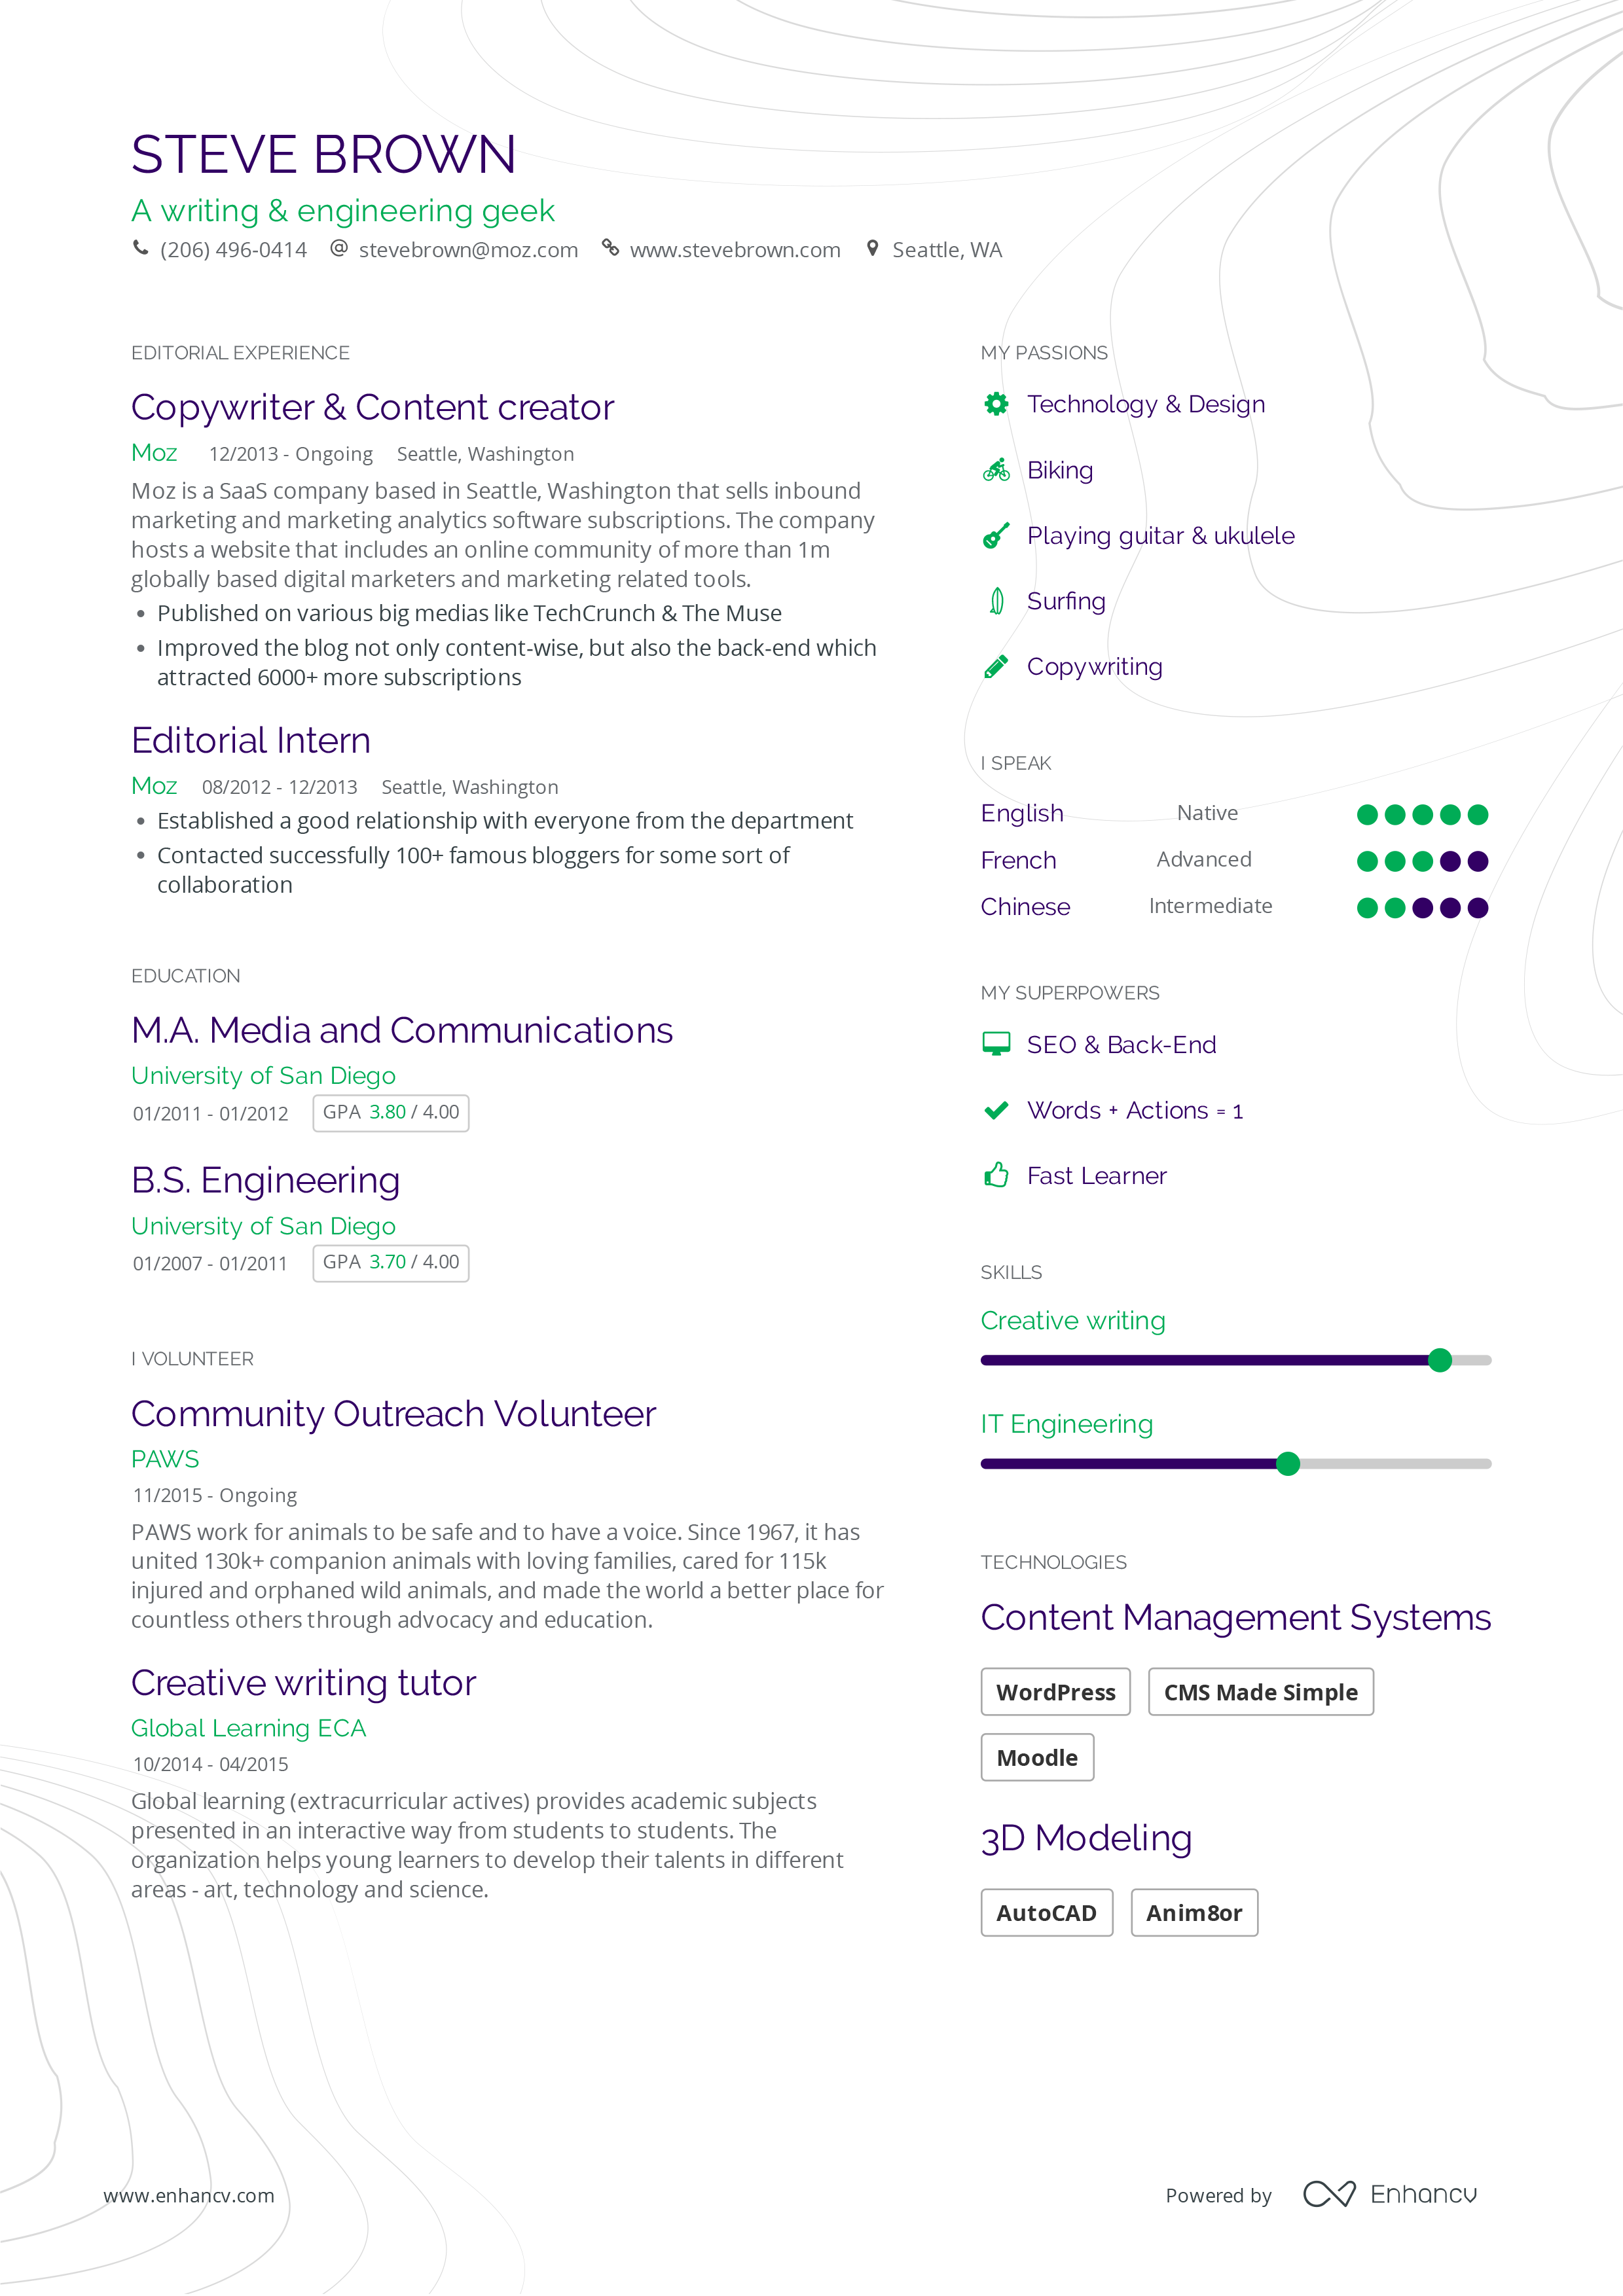 Enhancv resume builder - More Resume samples